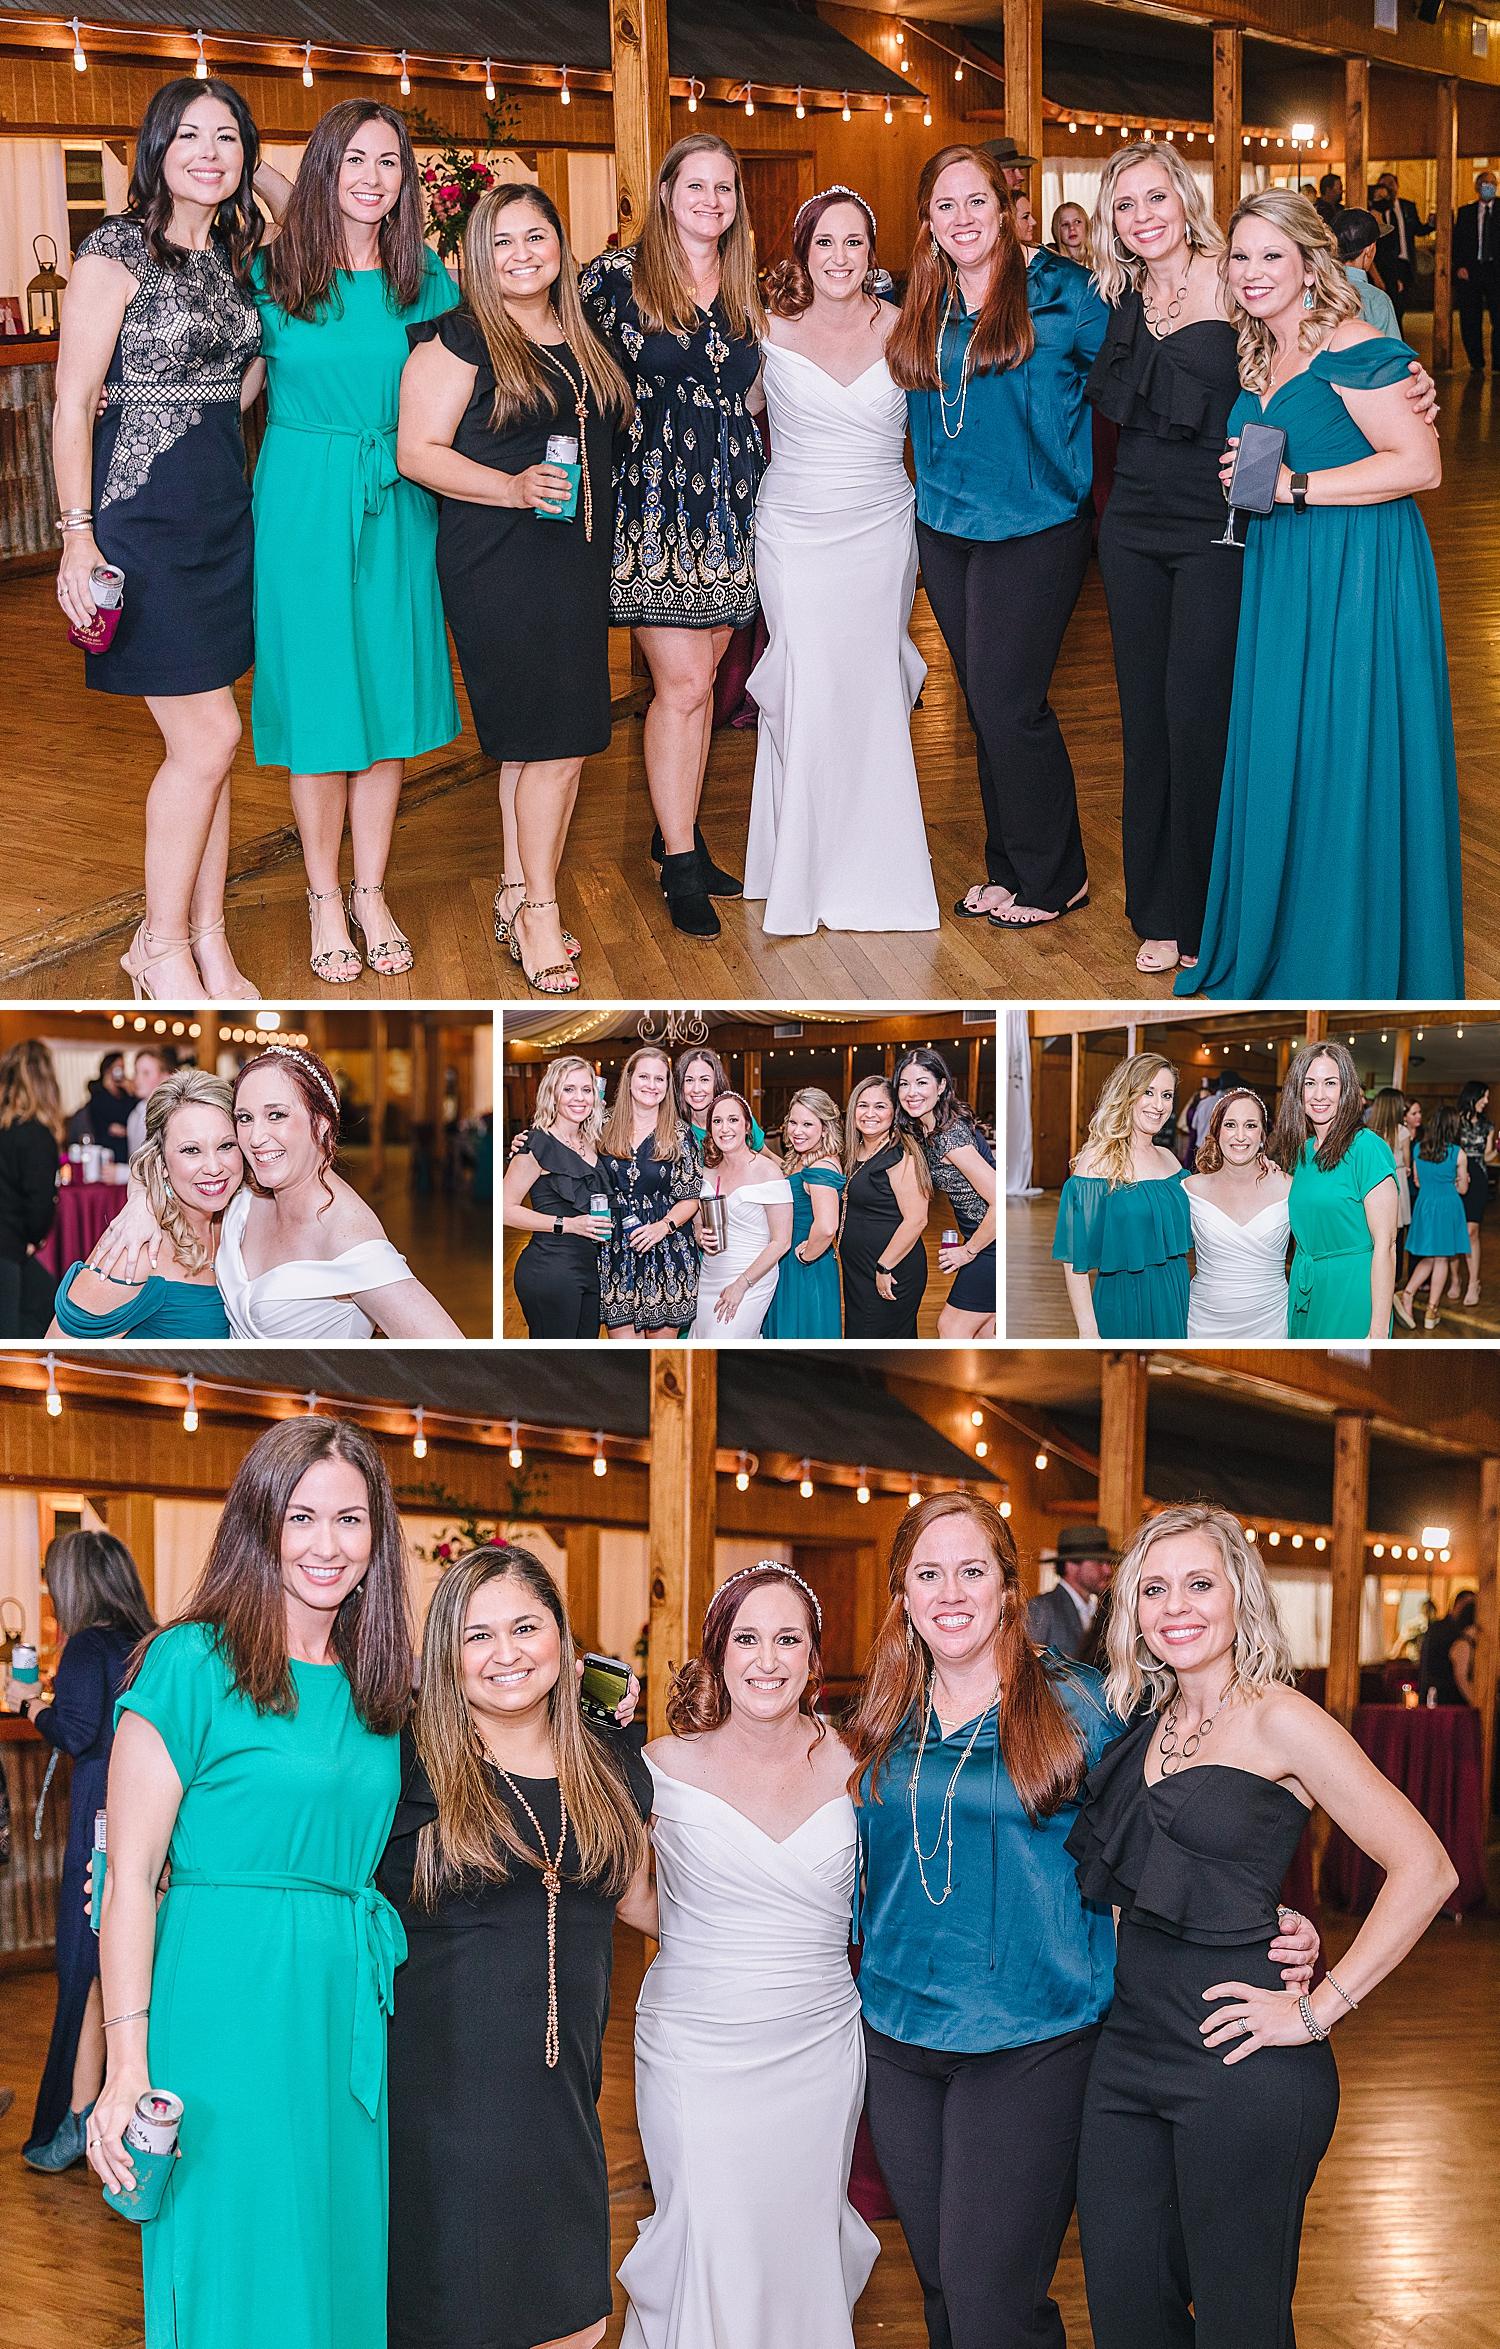 Jewel-Tone-Texas-Wedding-Valerie-Jason-Carly-Barton-Photography_0078.jpg